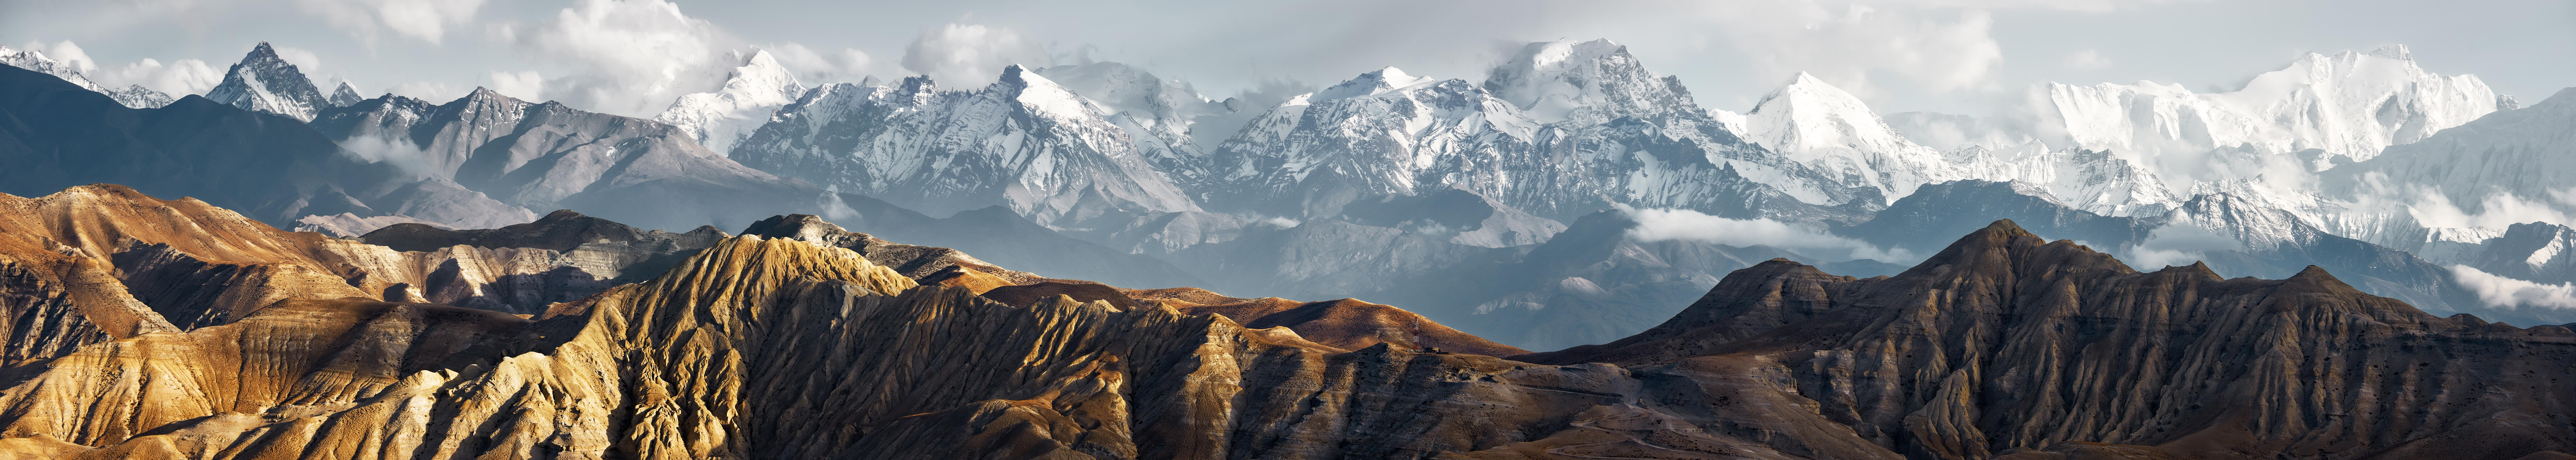 Obraz panorama gór